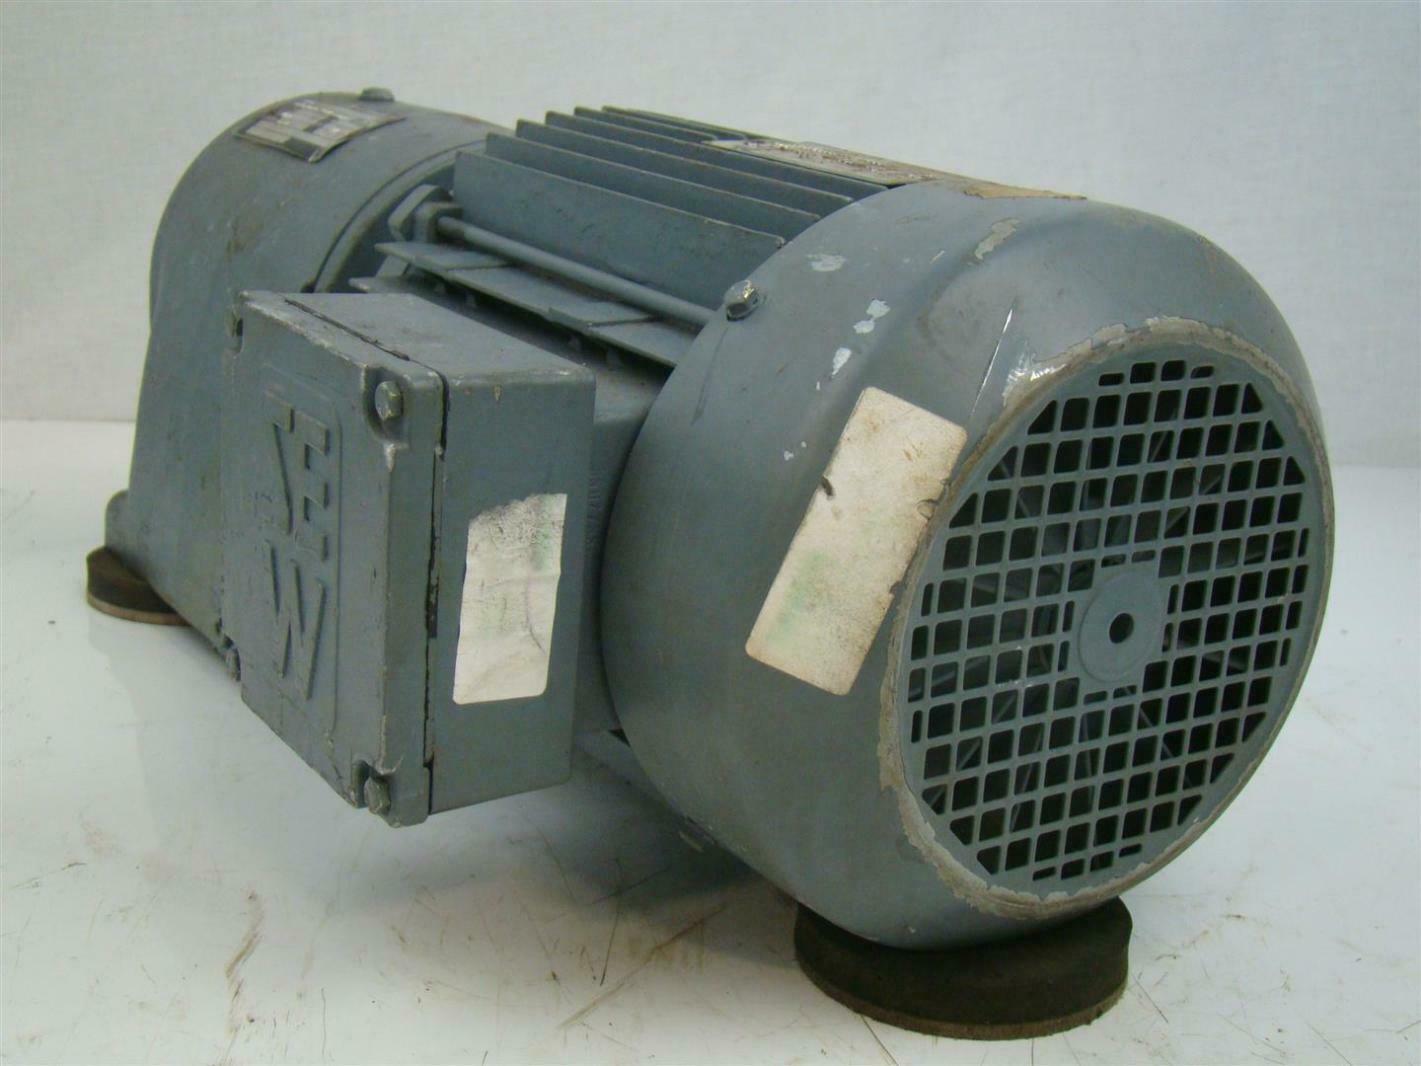 Sew eurodrive motor 1700rpm r60a dt100l4 ebay for Sew motors and drives